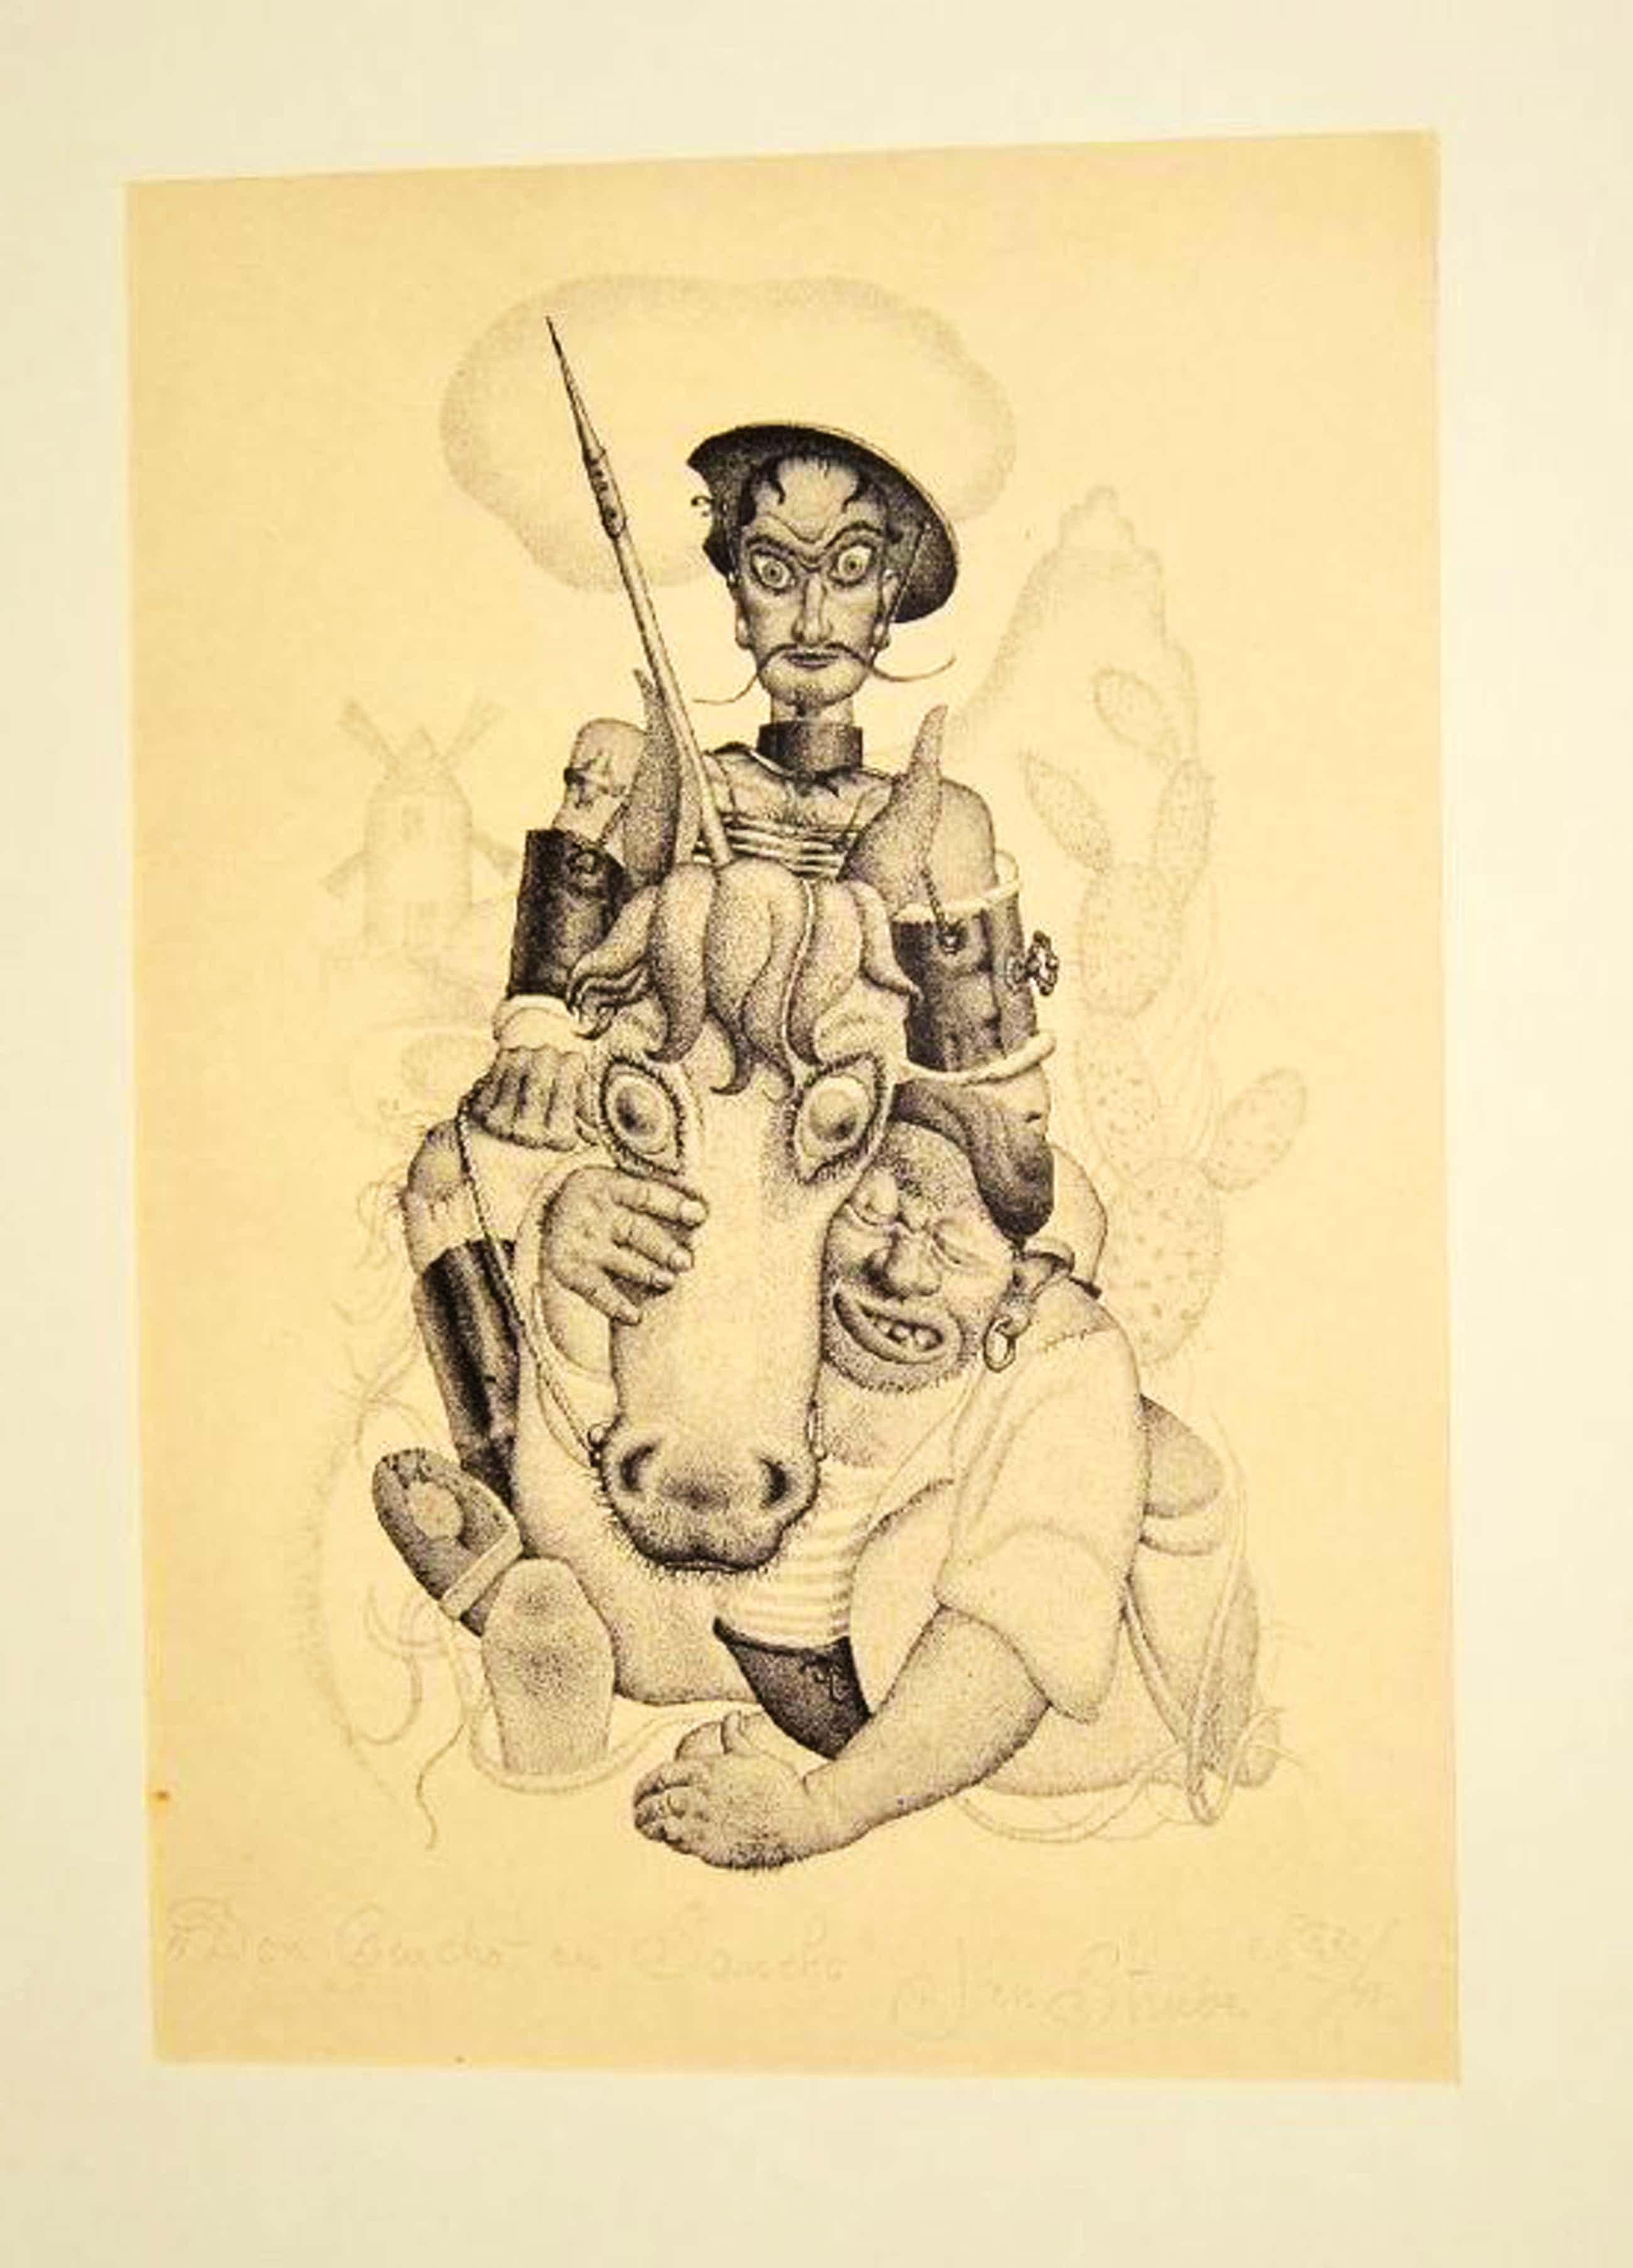 Jan Strube: Lino - Don Quichotte et Sancho No. 39 kopen? Bied vanaf 130!